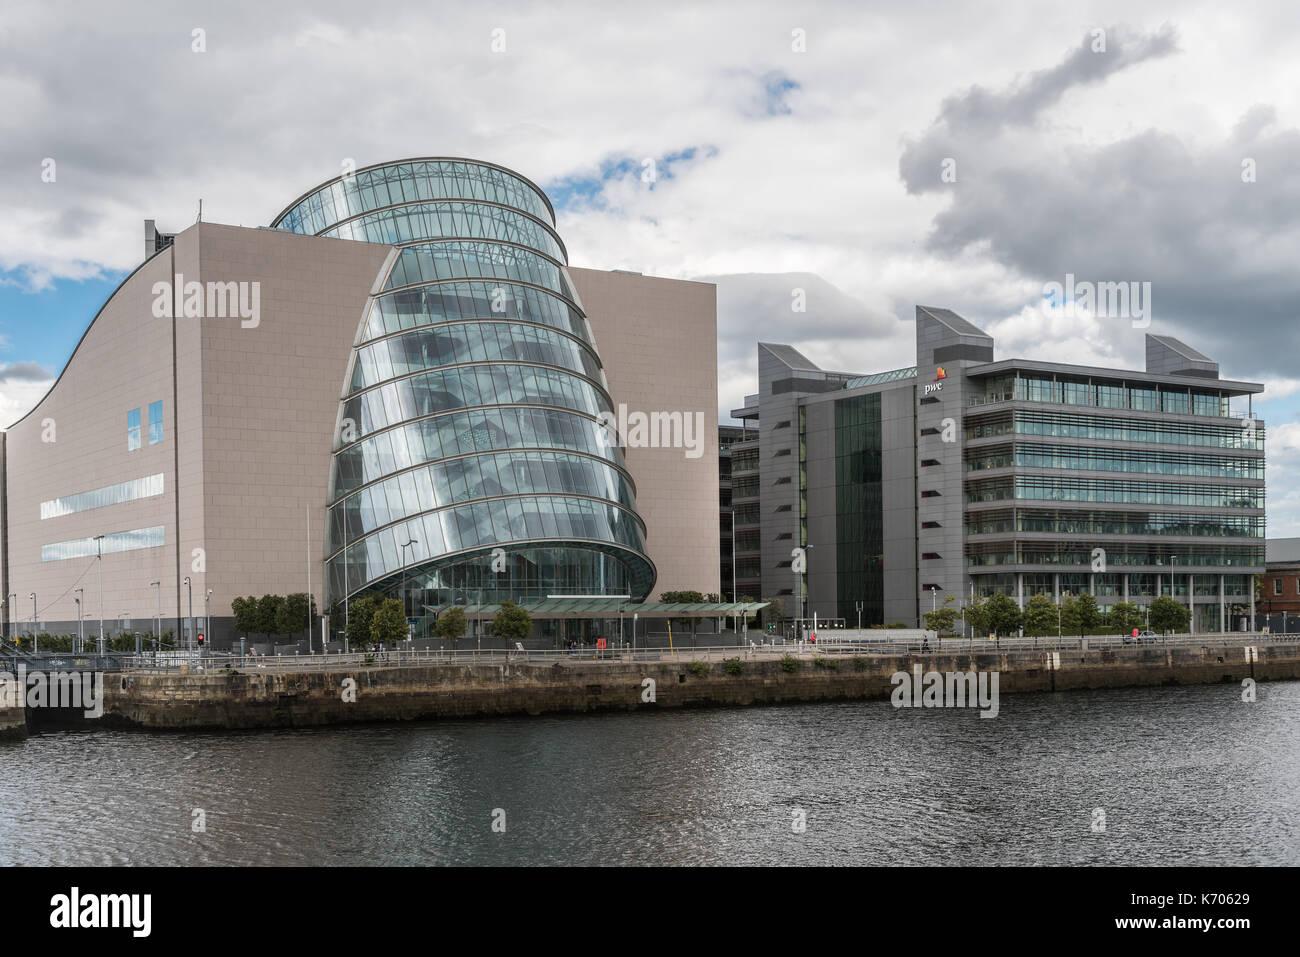 Nationwide Building Society Ireland